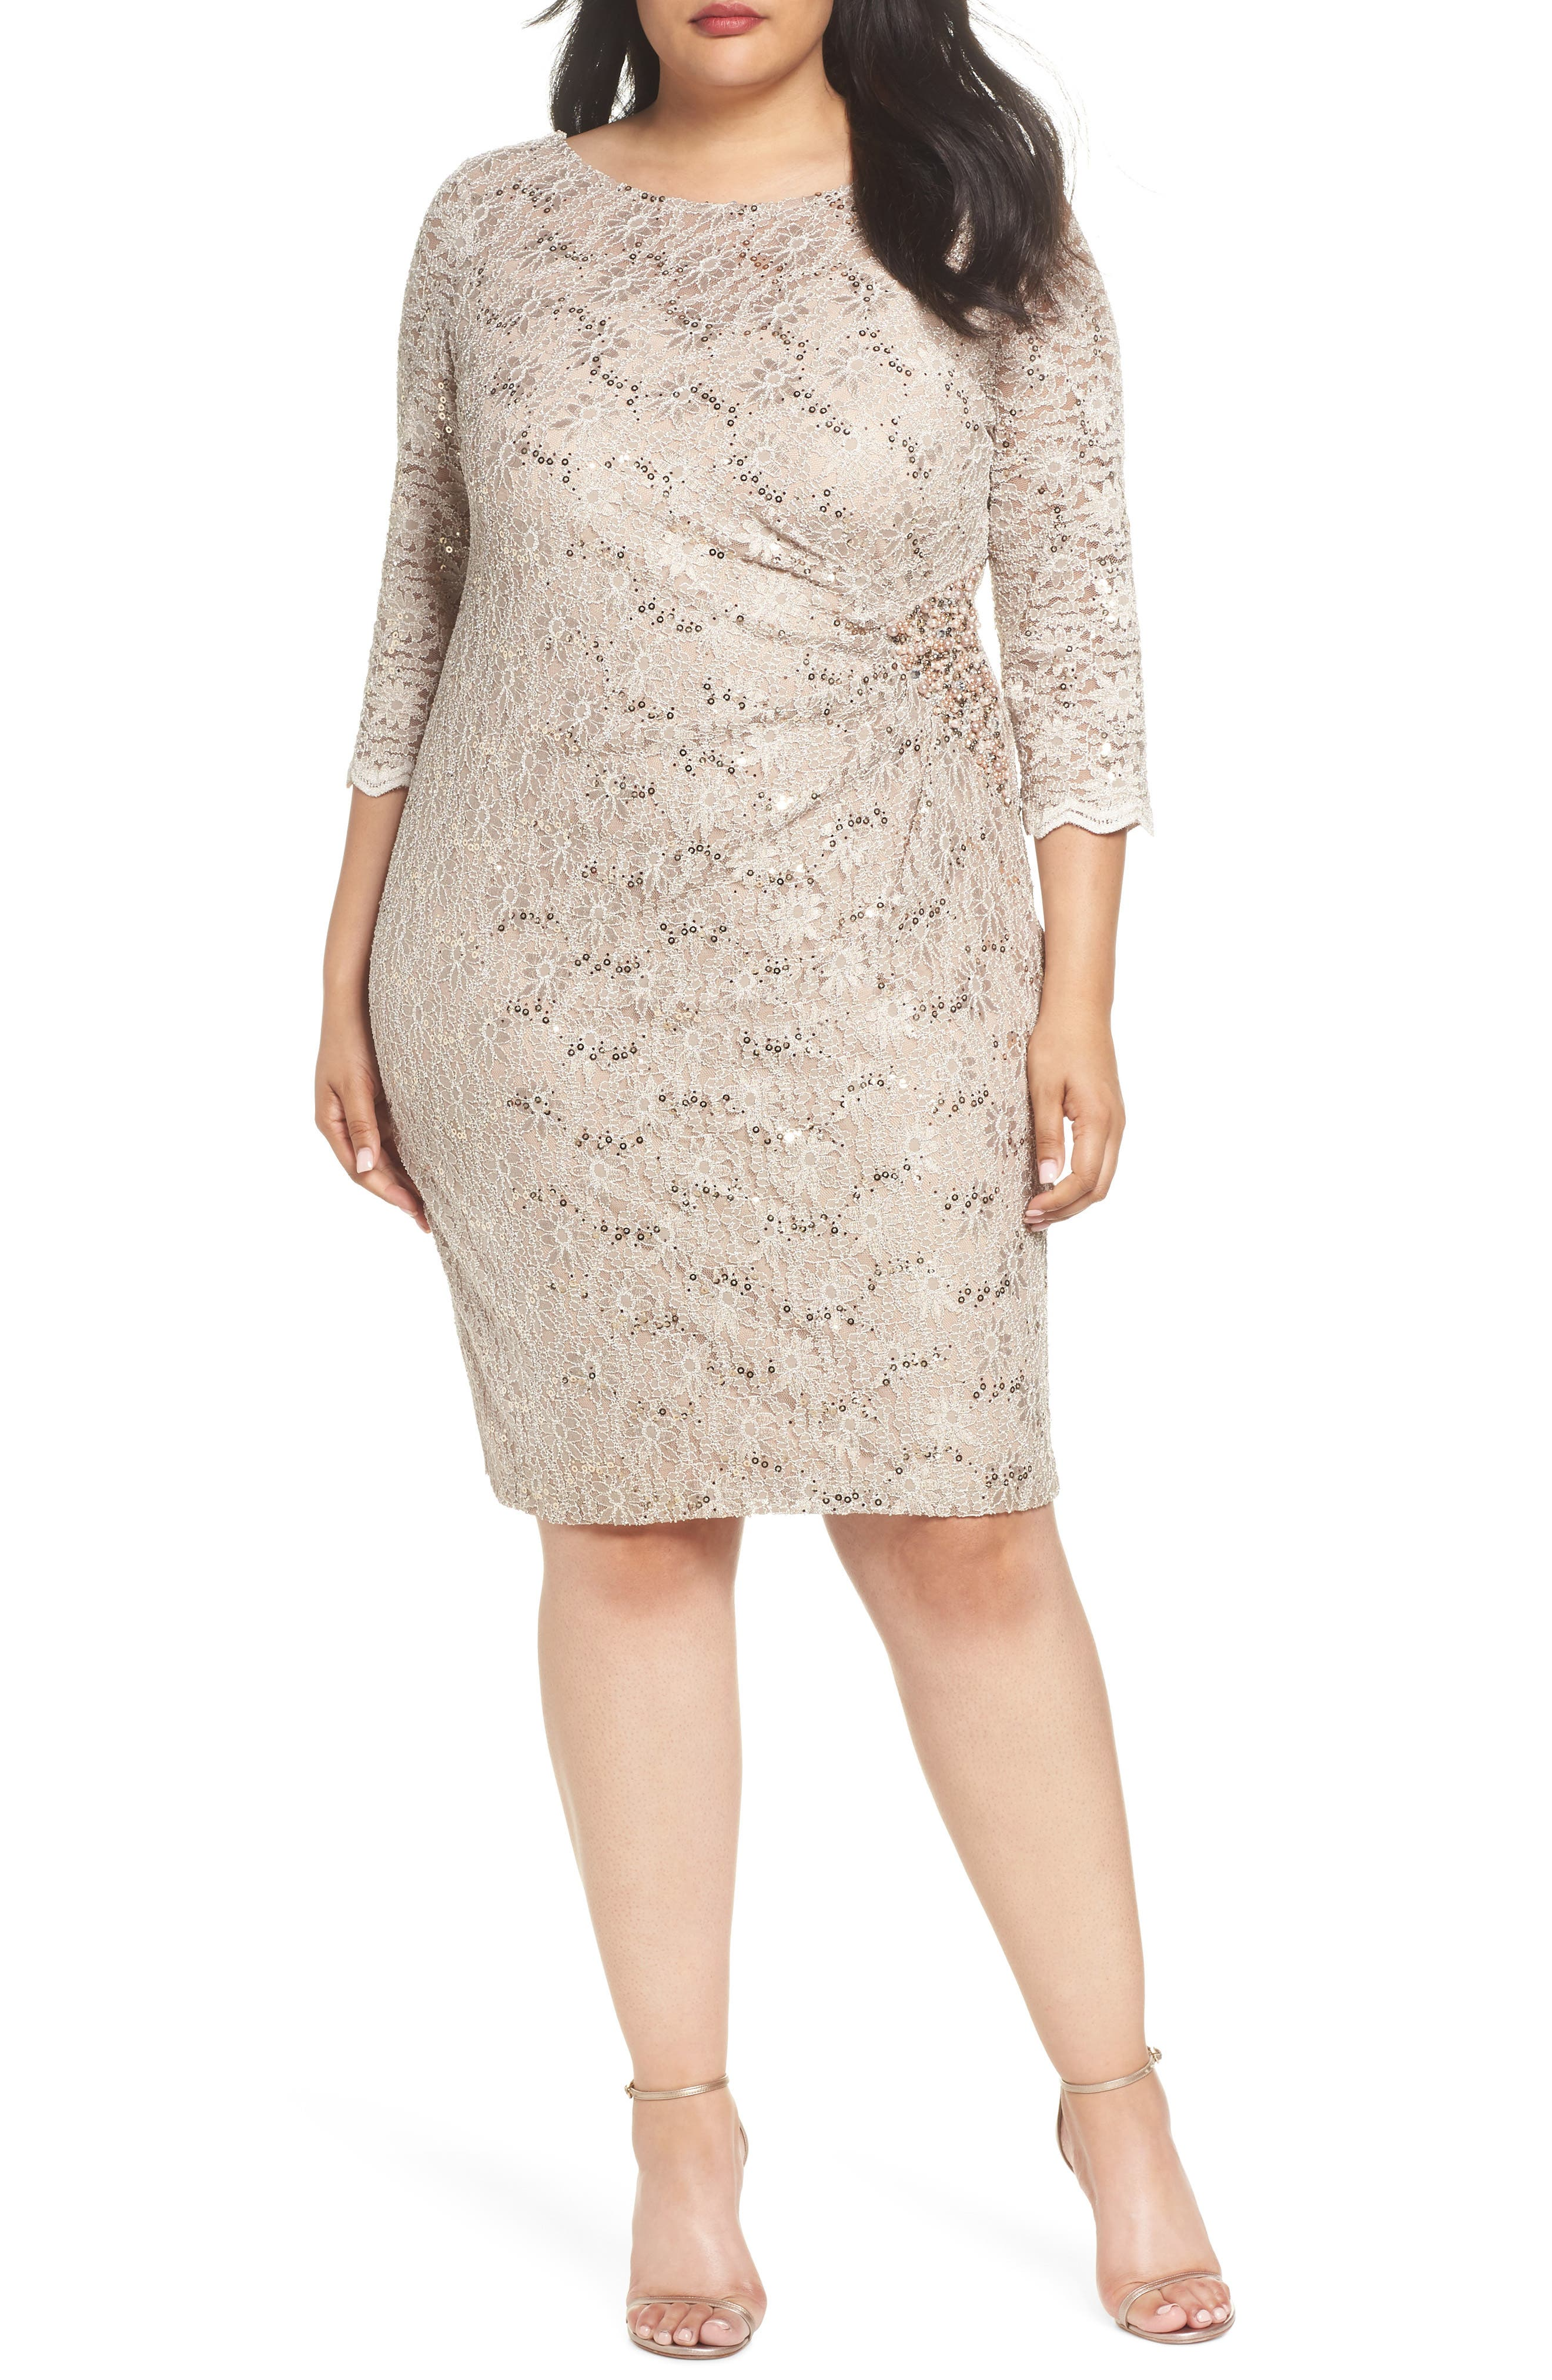 Embellished Illusion Lace Shift Dress,                             Main thumbnail 1, color,                             250